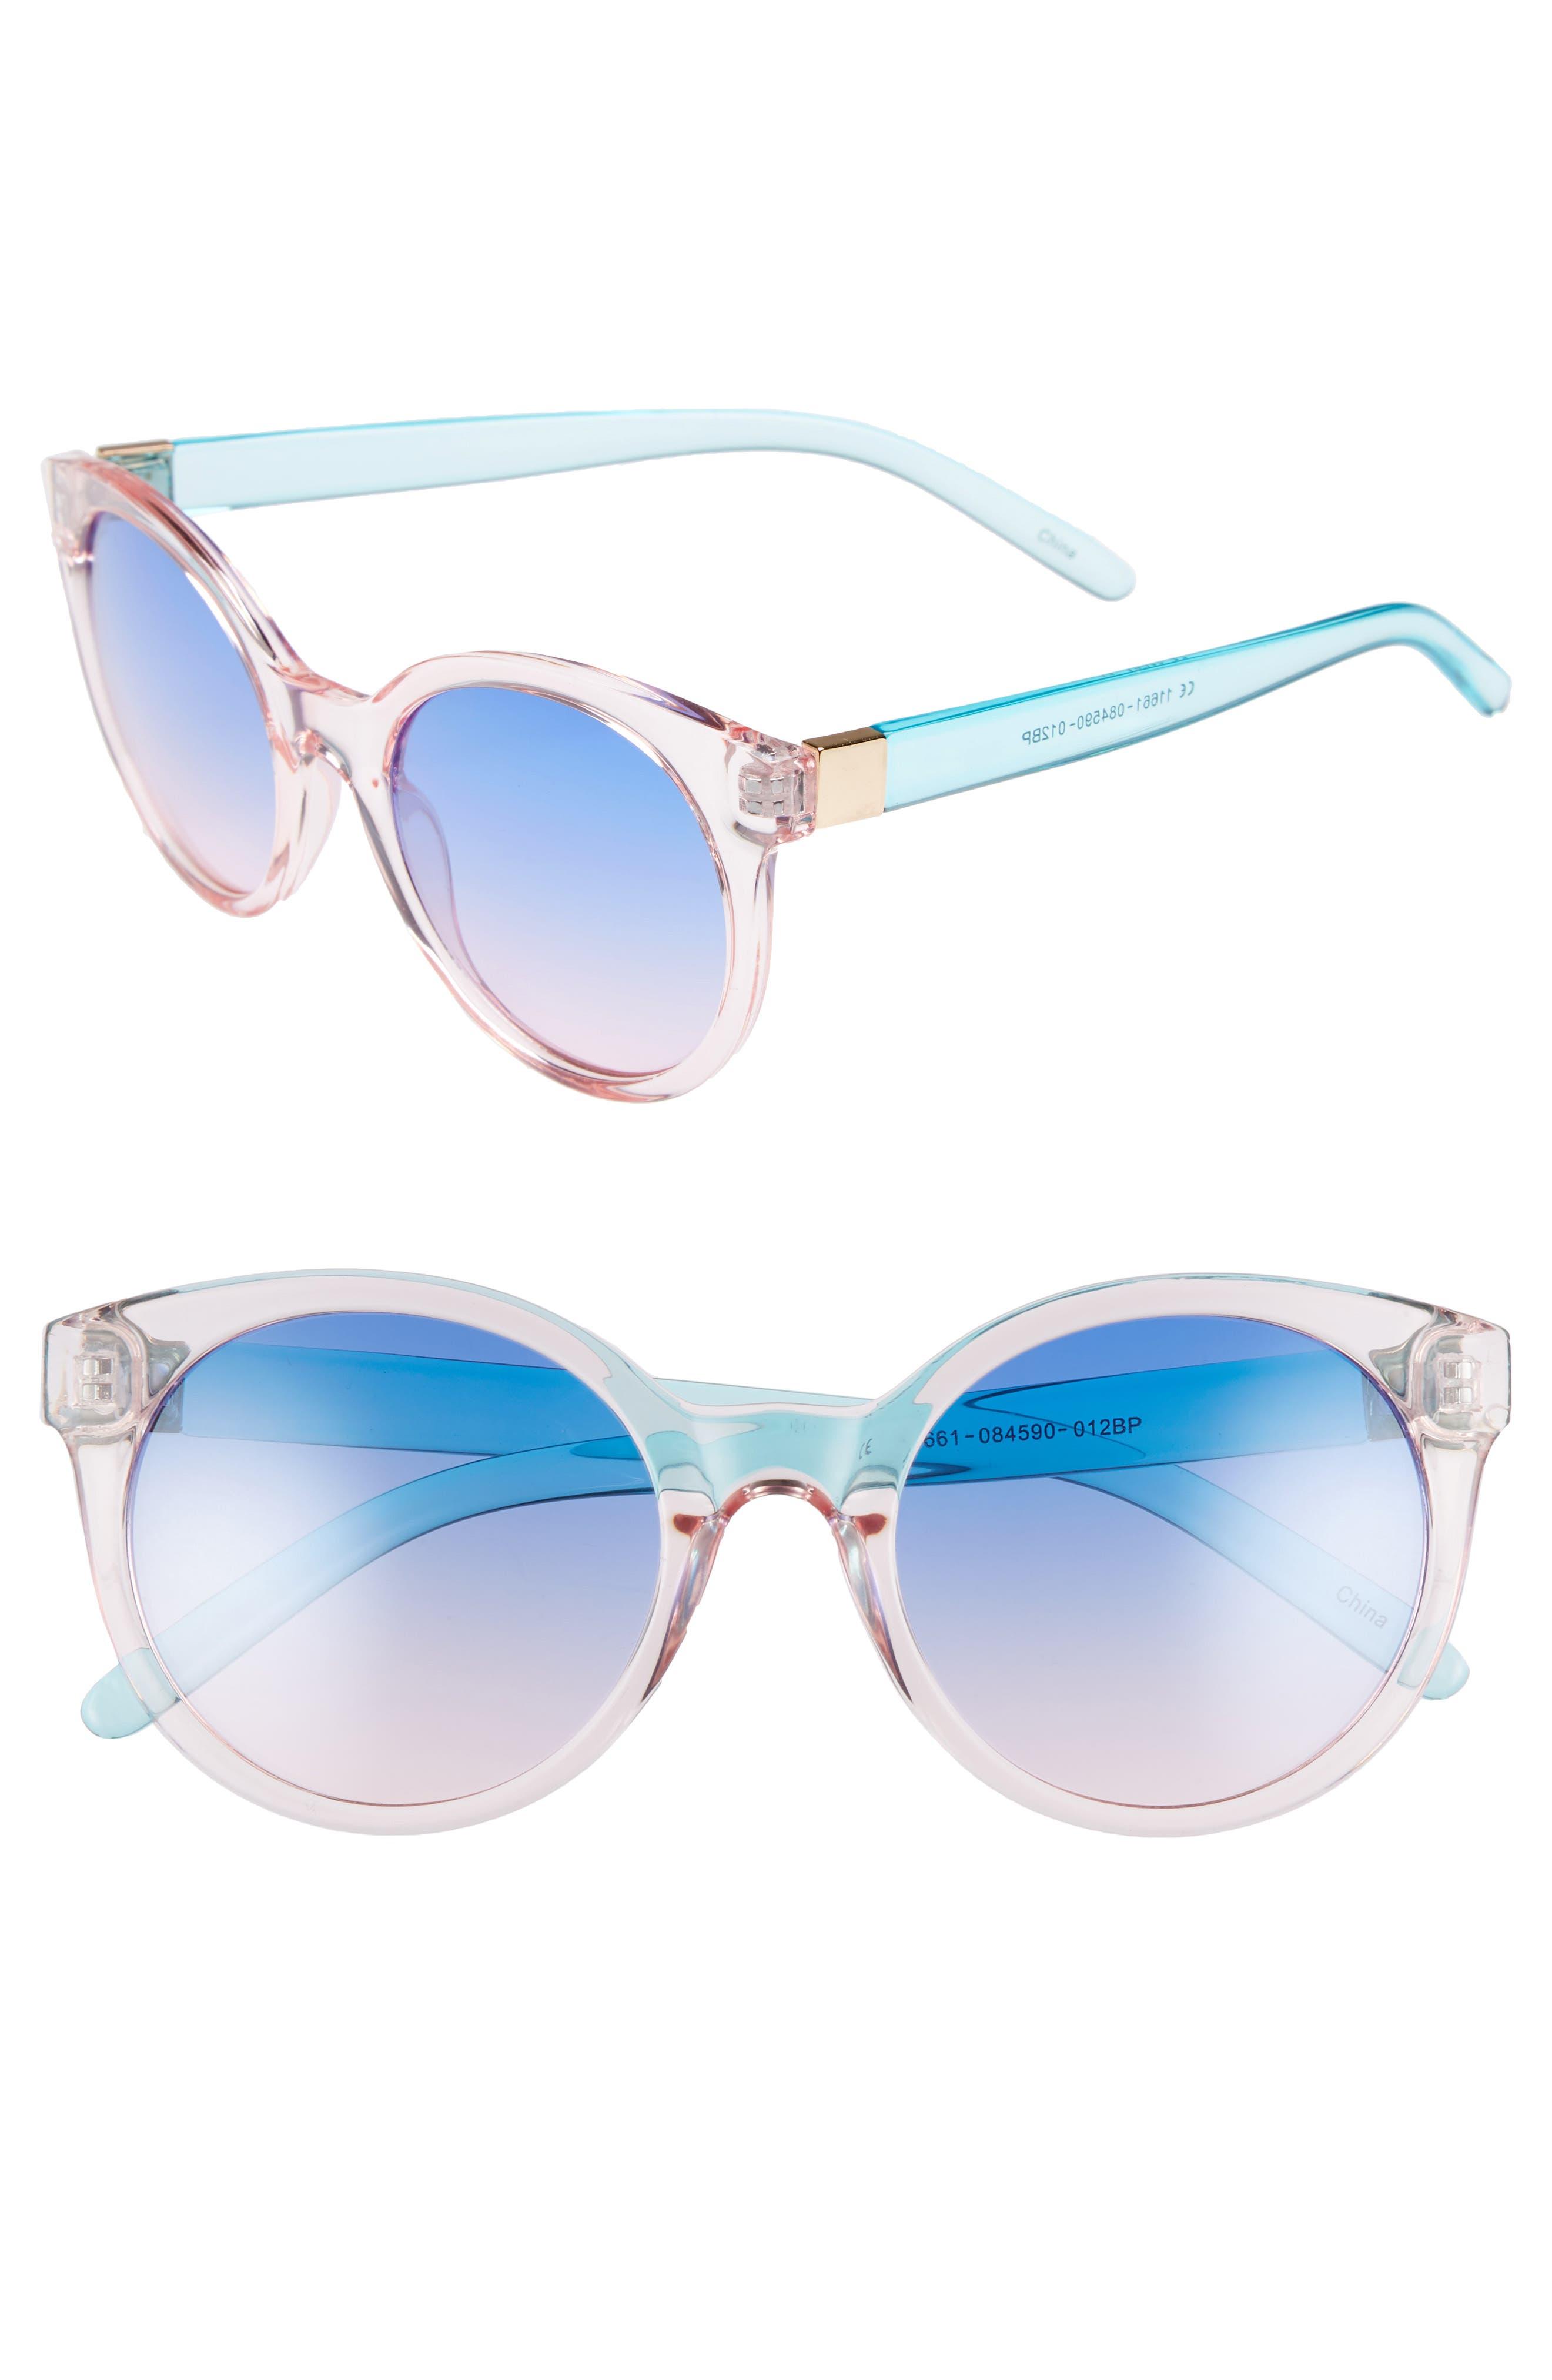 Transparent Round Sunglasses,                             Main thumbnail 1, color,                             100